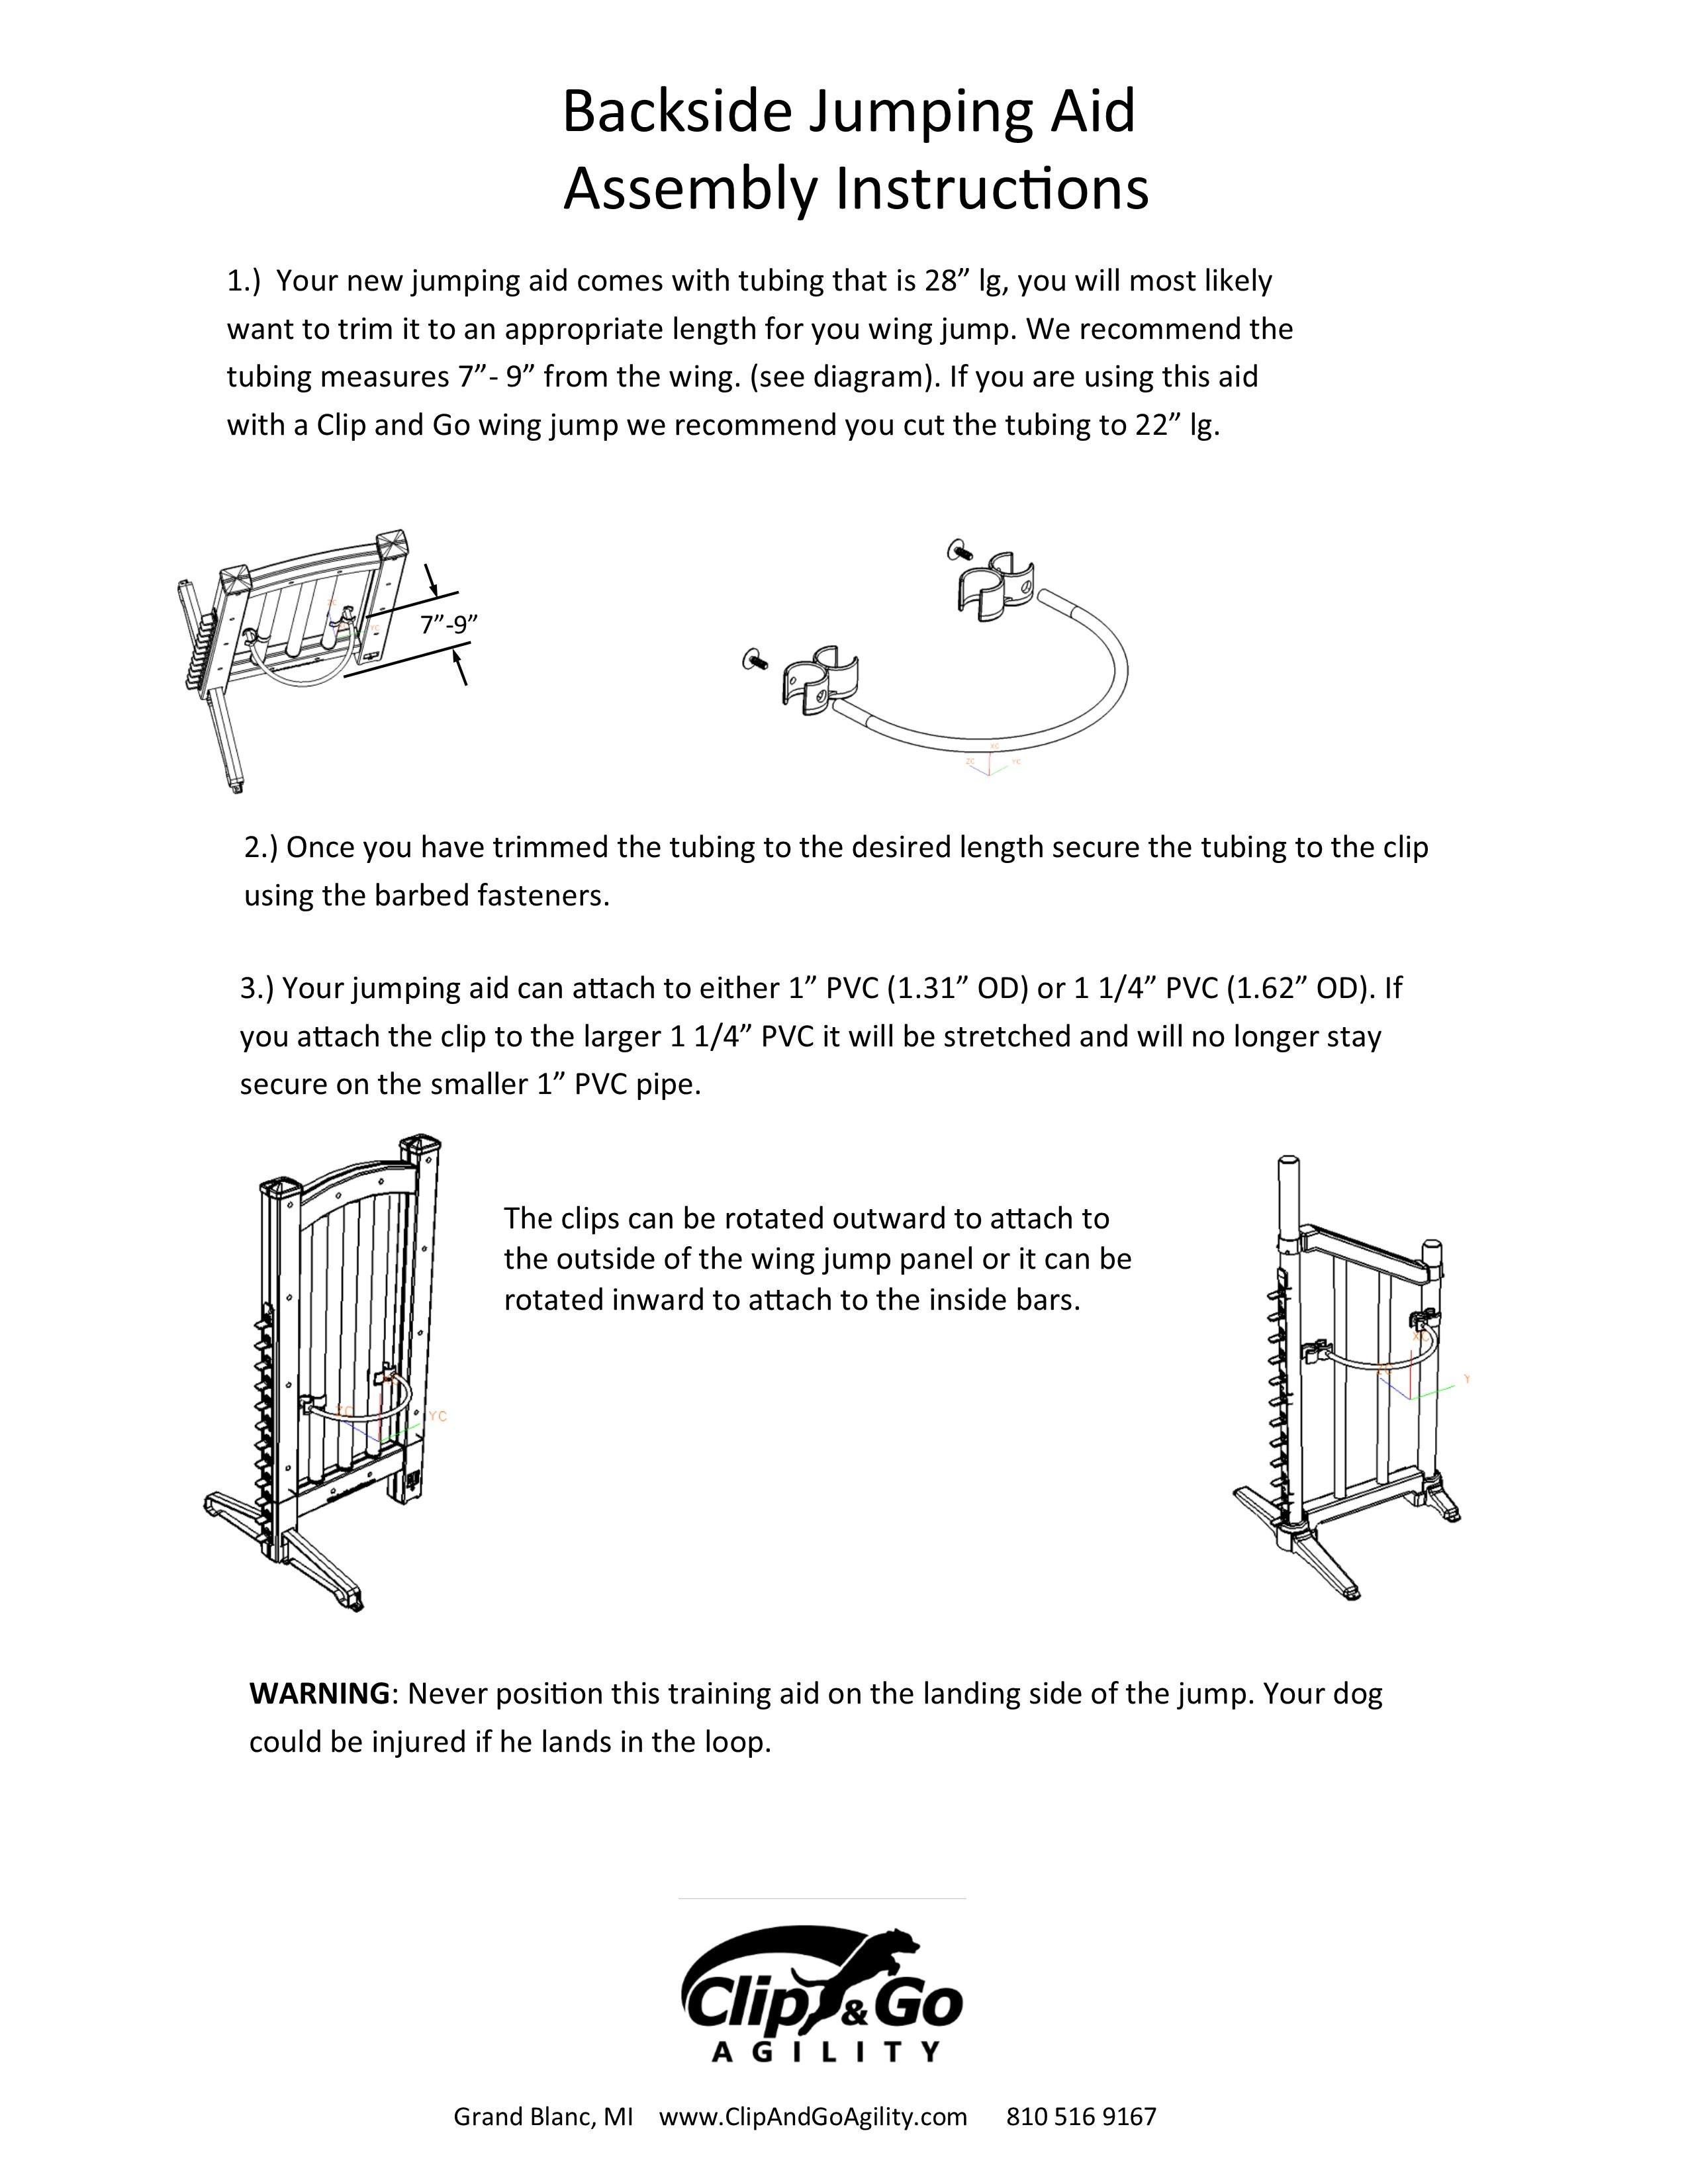 backside-aid-instructions-1.jpg